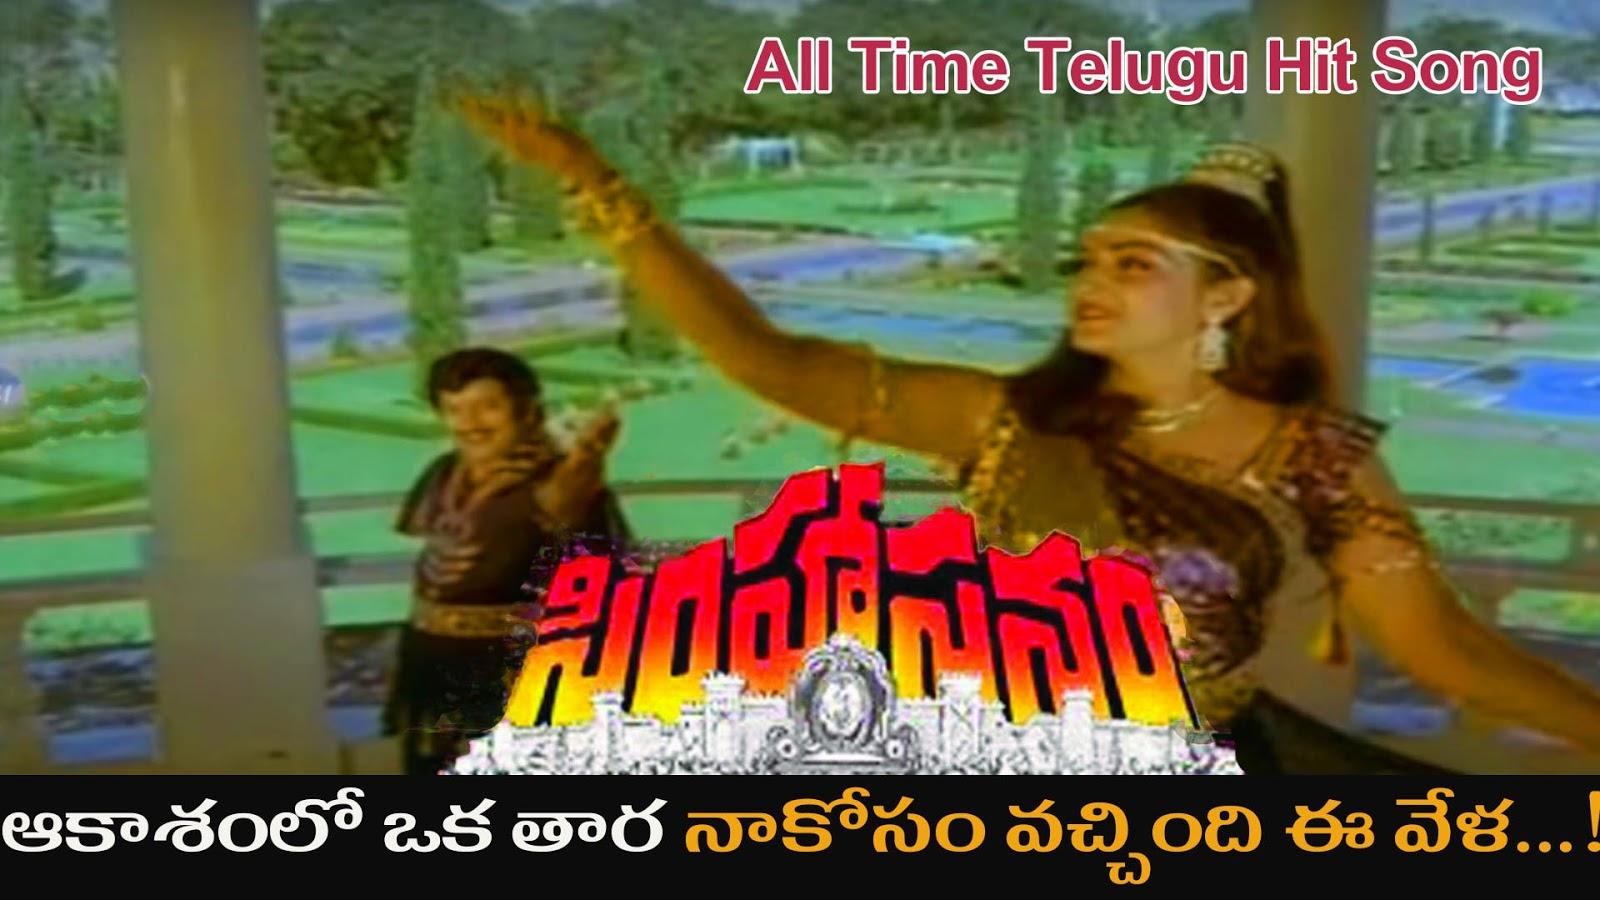 Bappi Lahiri Telugu Naa Songs